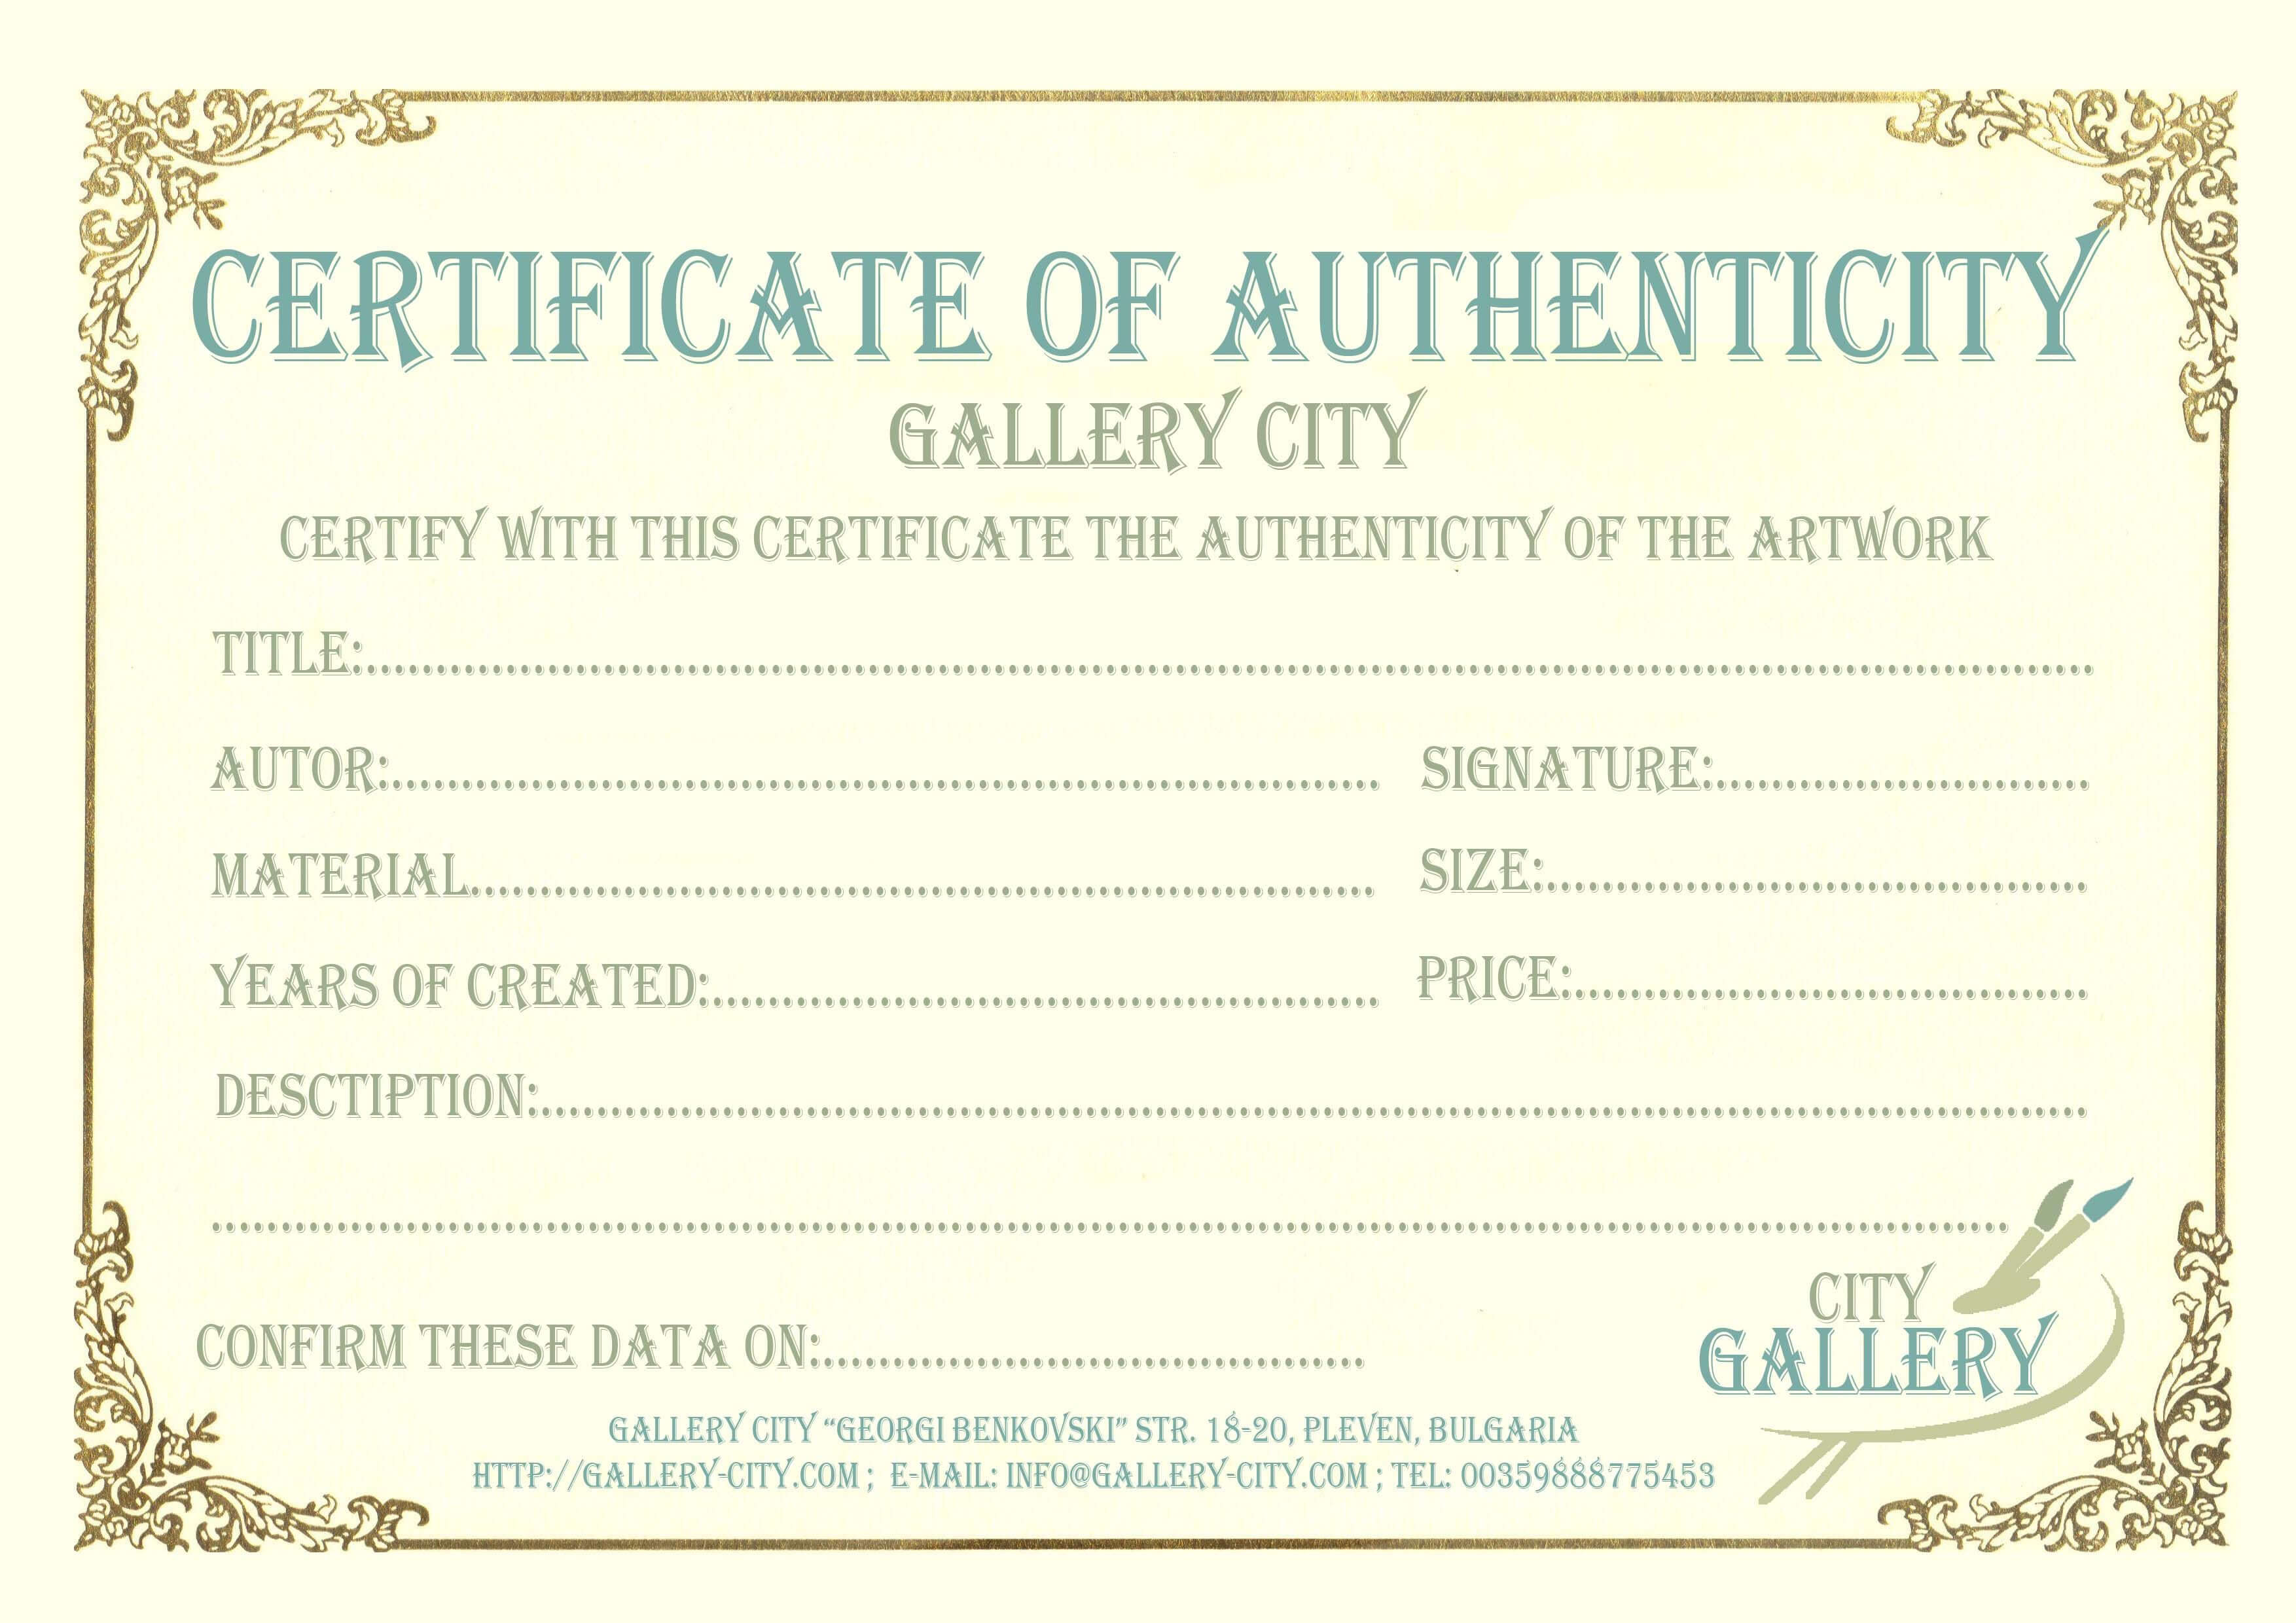 Certificate Authenticity Template Art Authenticity Throughout Photography Certificate Of Authenticity Template